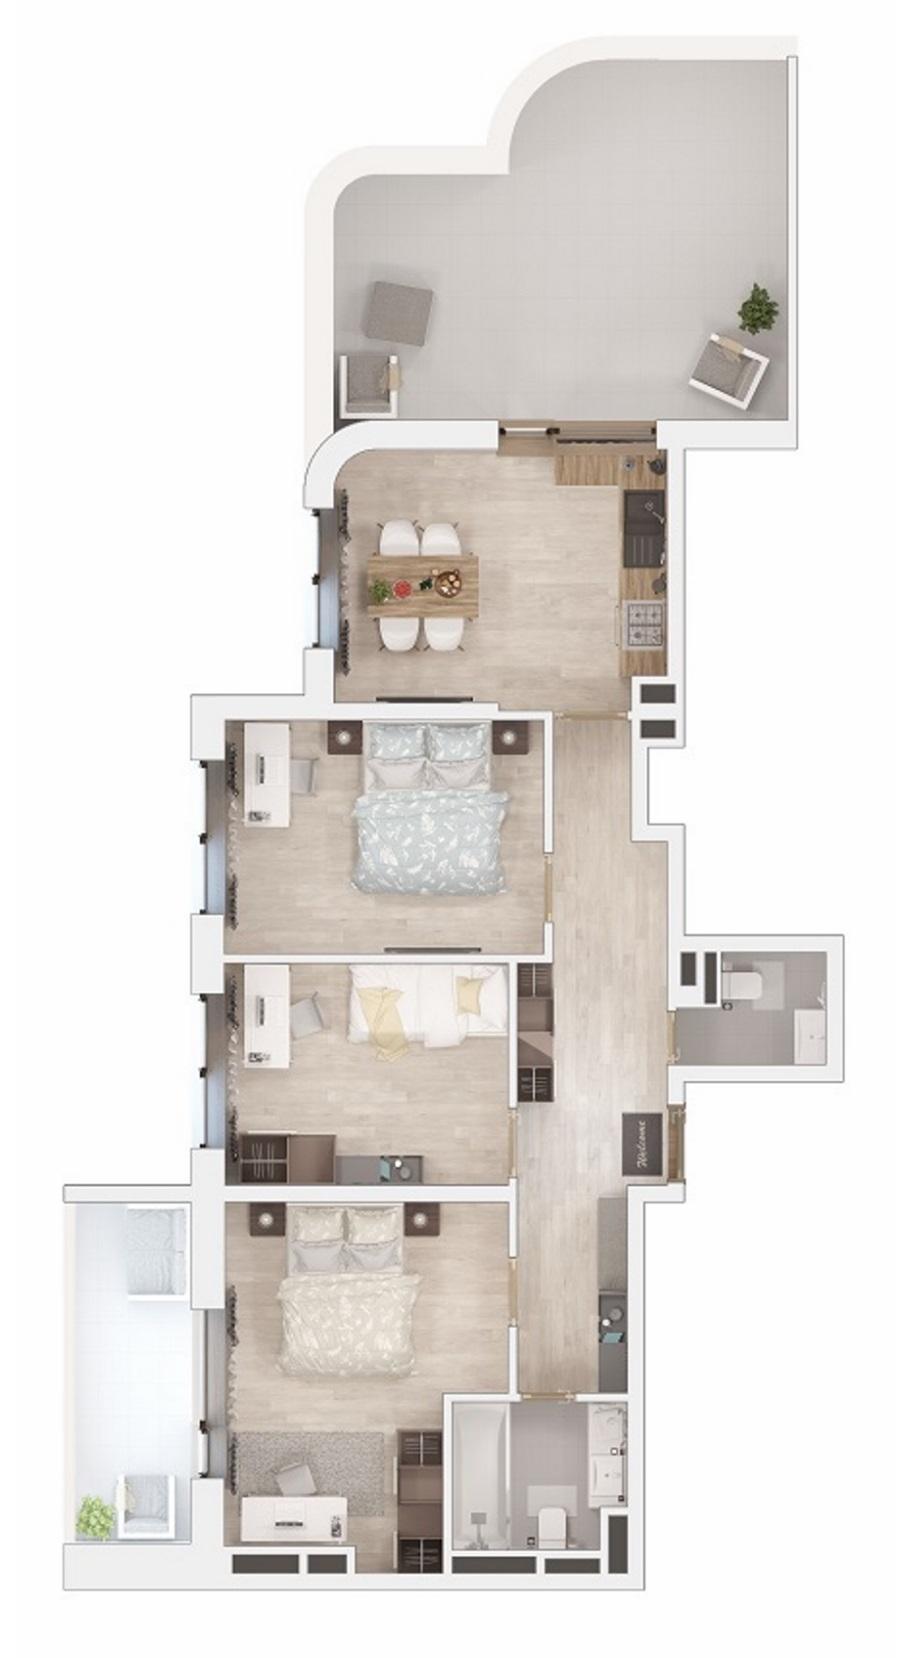 Квартира или дом в Одессе 18-1S_kv._6(3d)